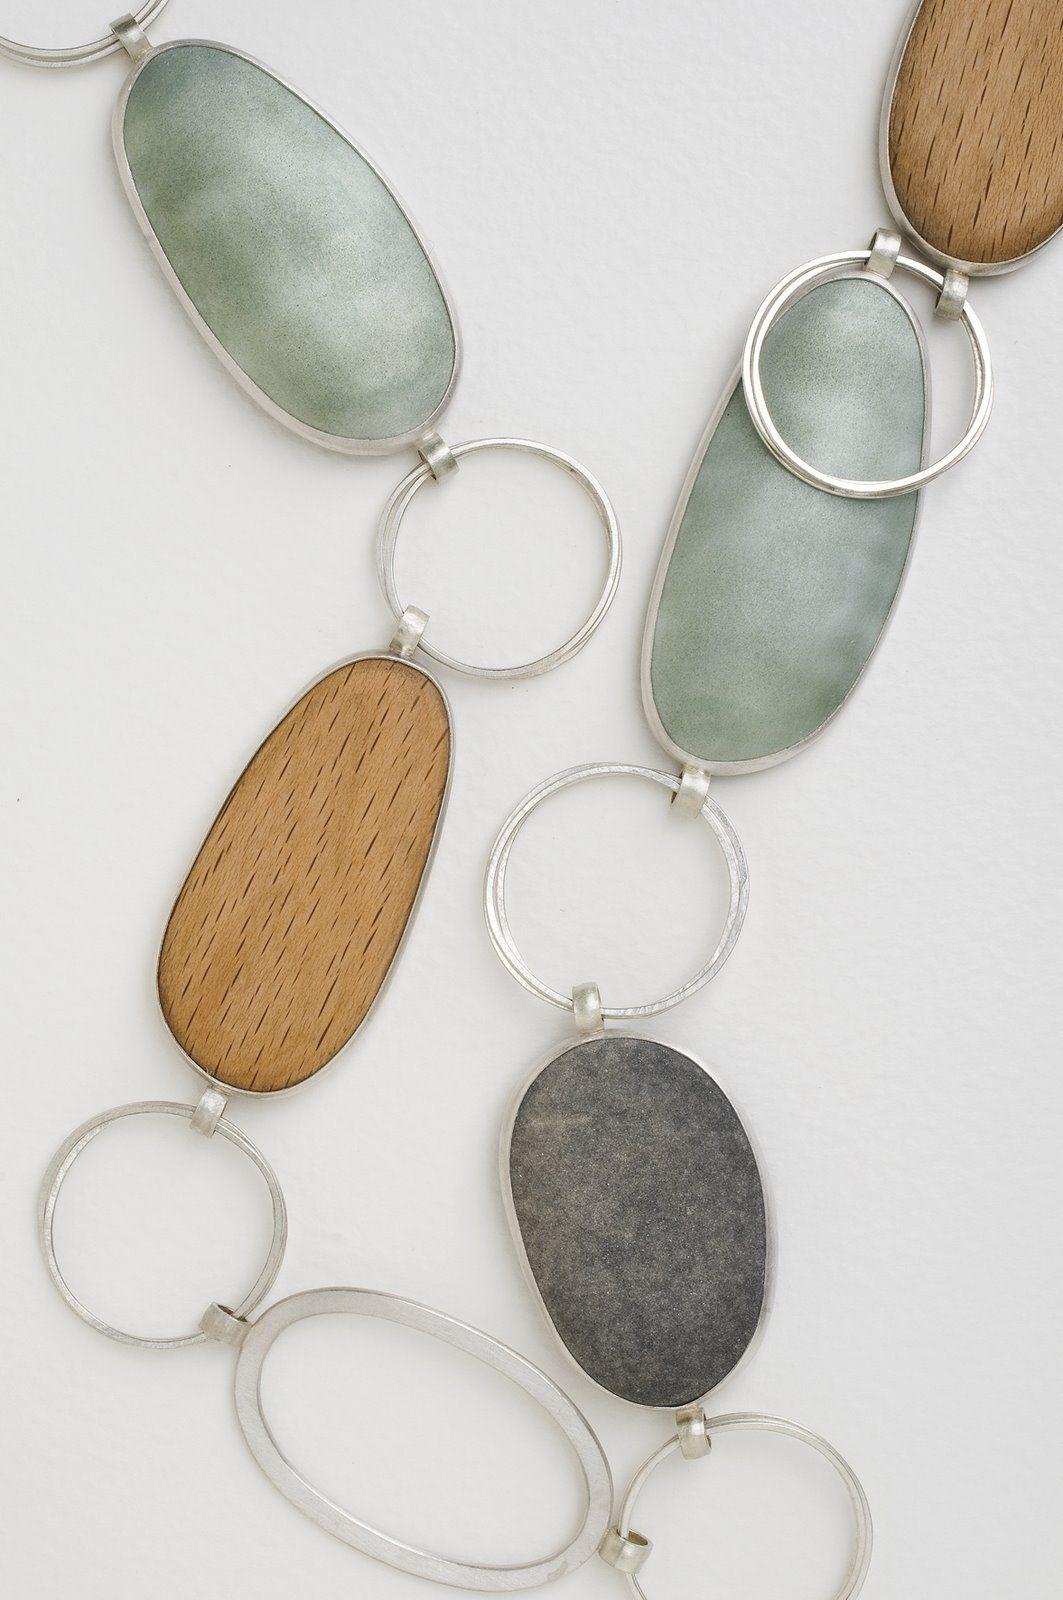 Grace Girvan Jewellery   Enamel + pebble + wood